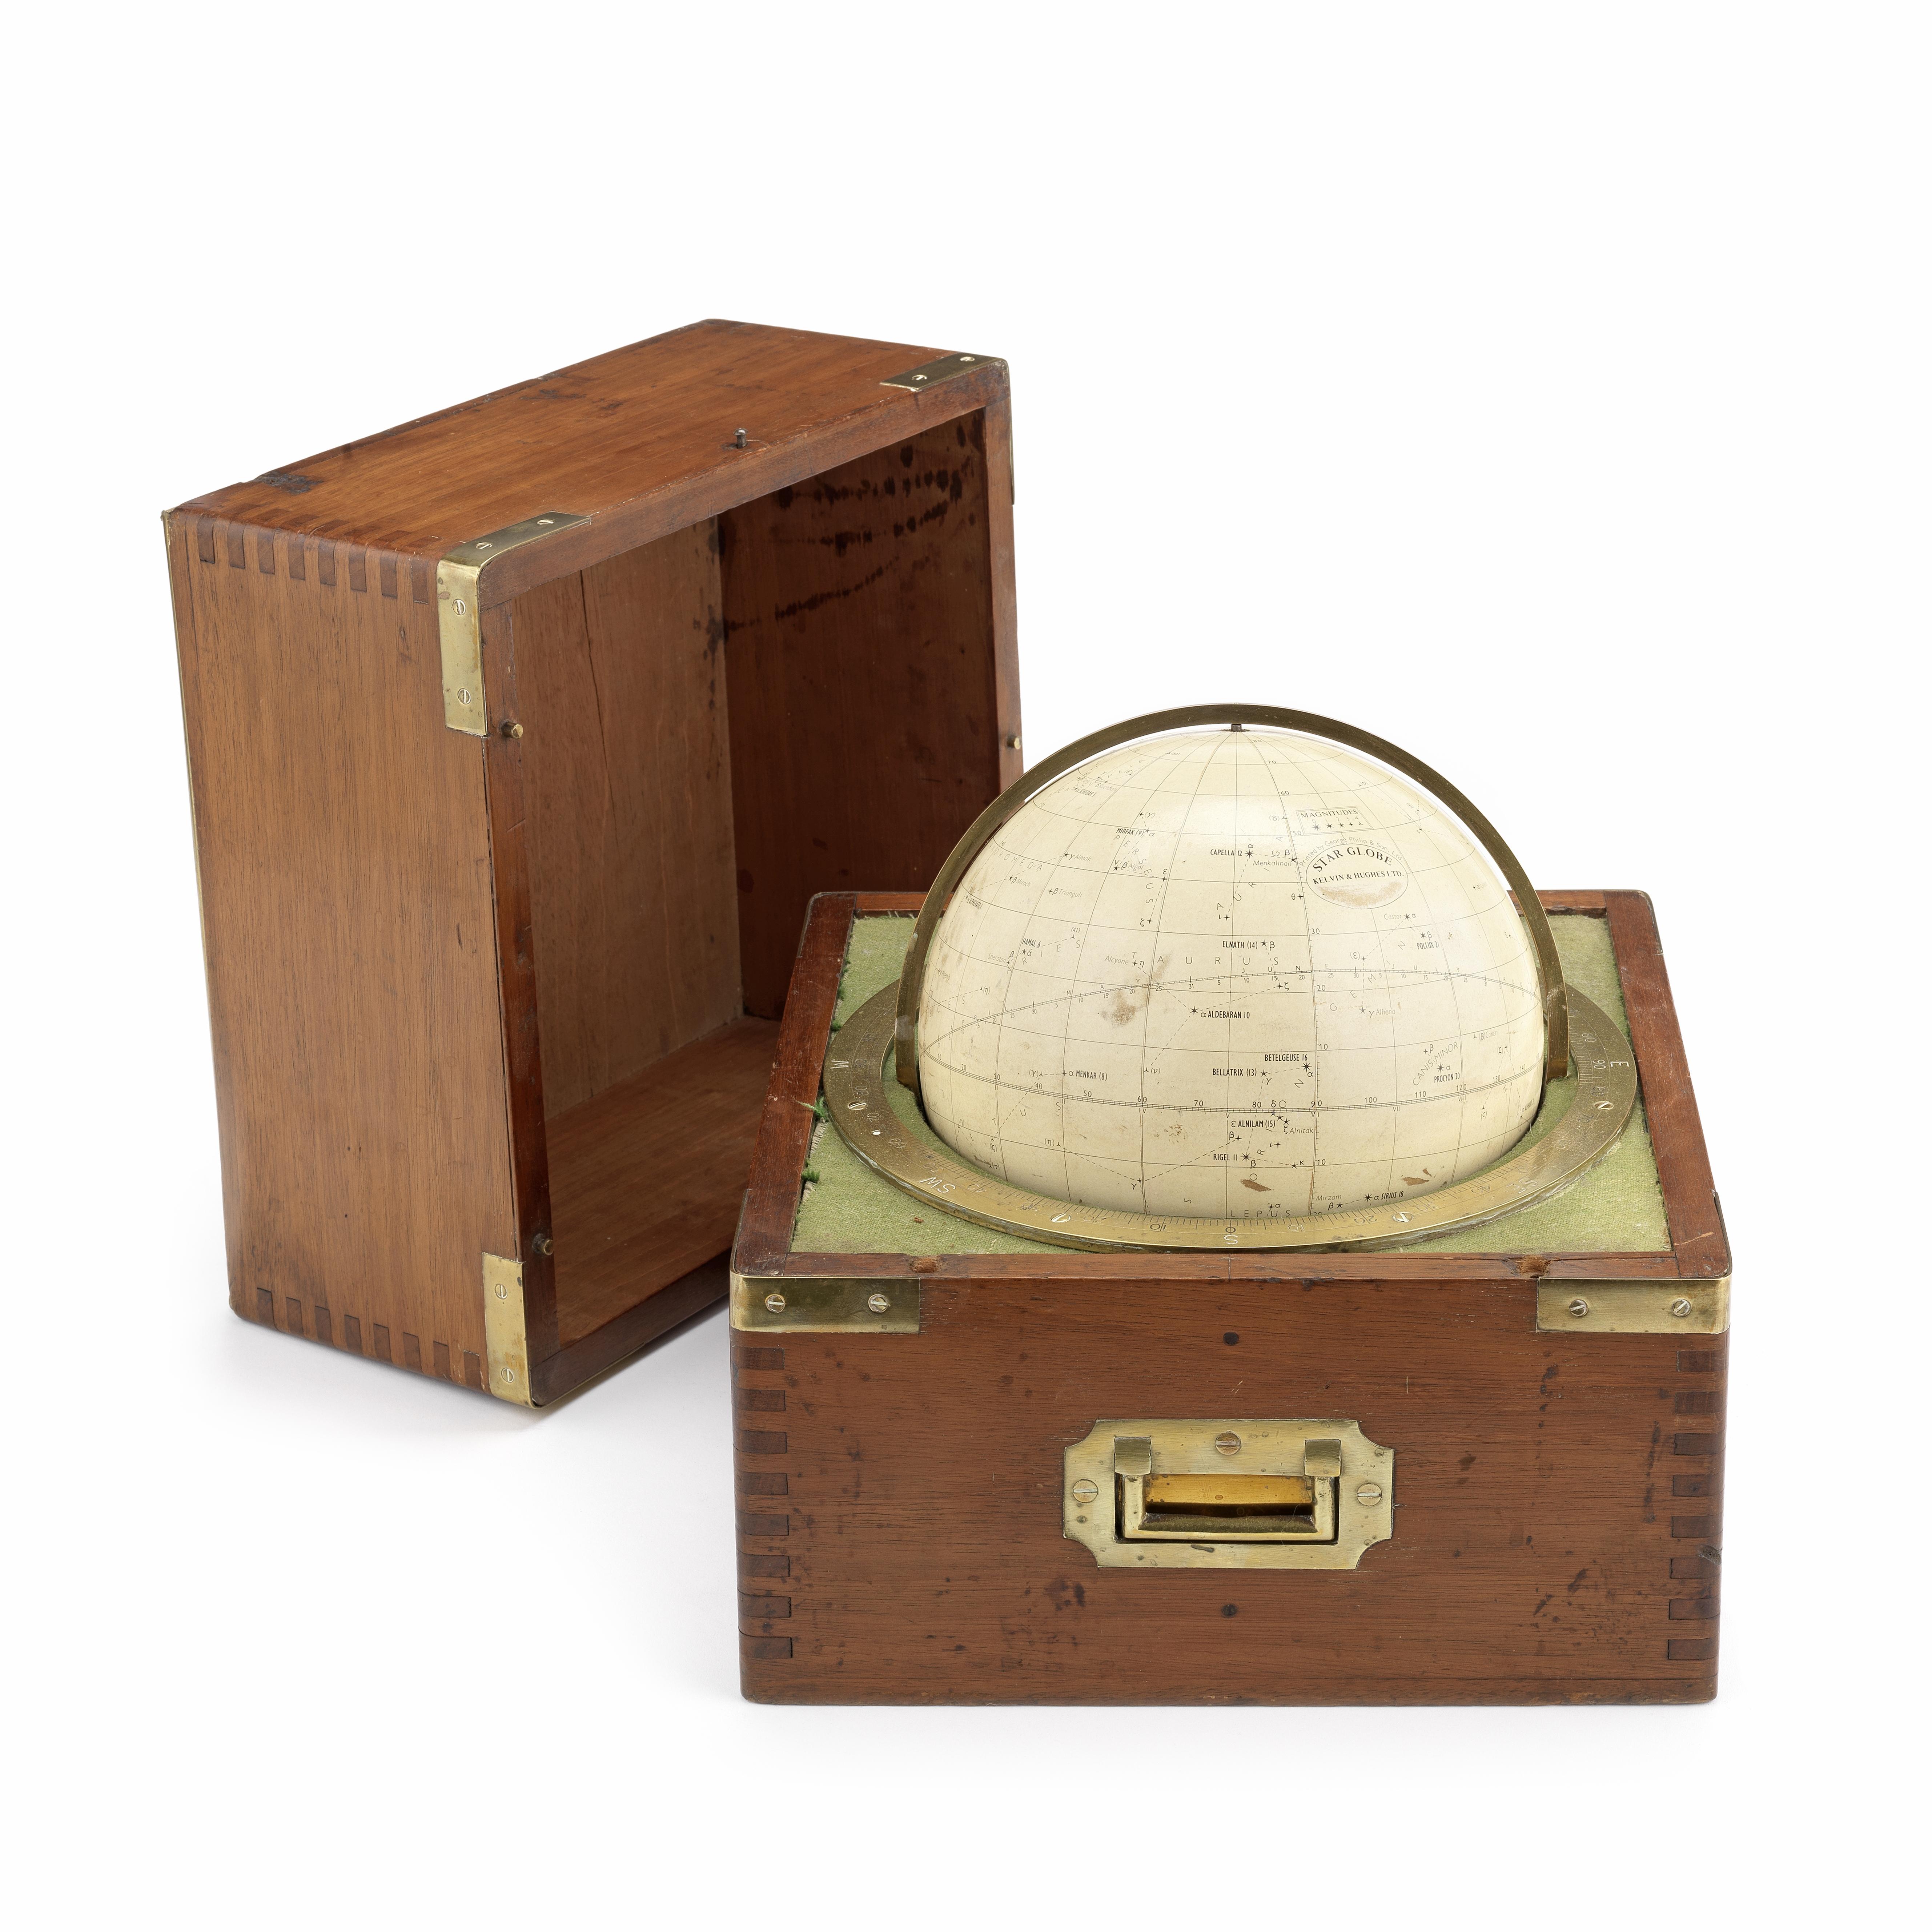 A Kelvin & Hughes Ltd 7 1/4-inch Star globe, English, mid 20th century,